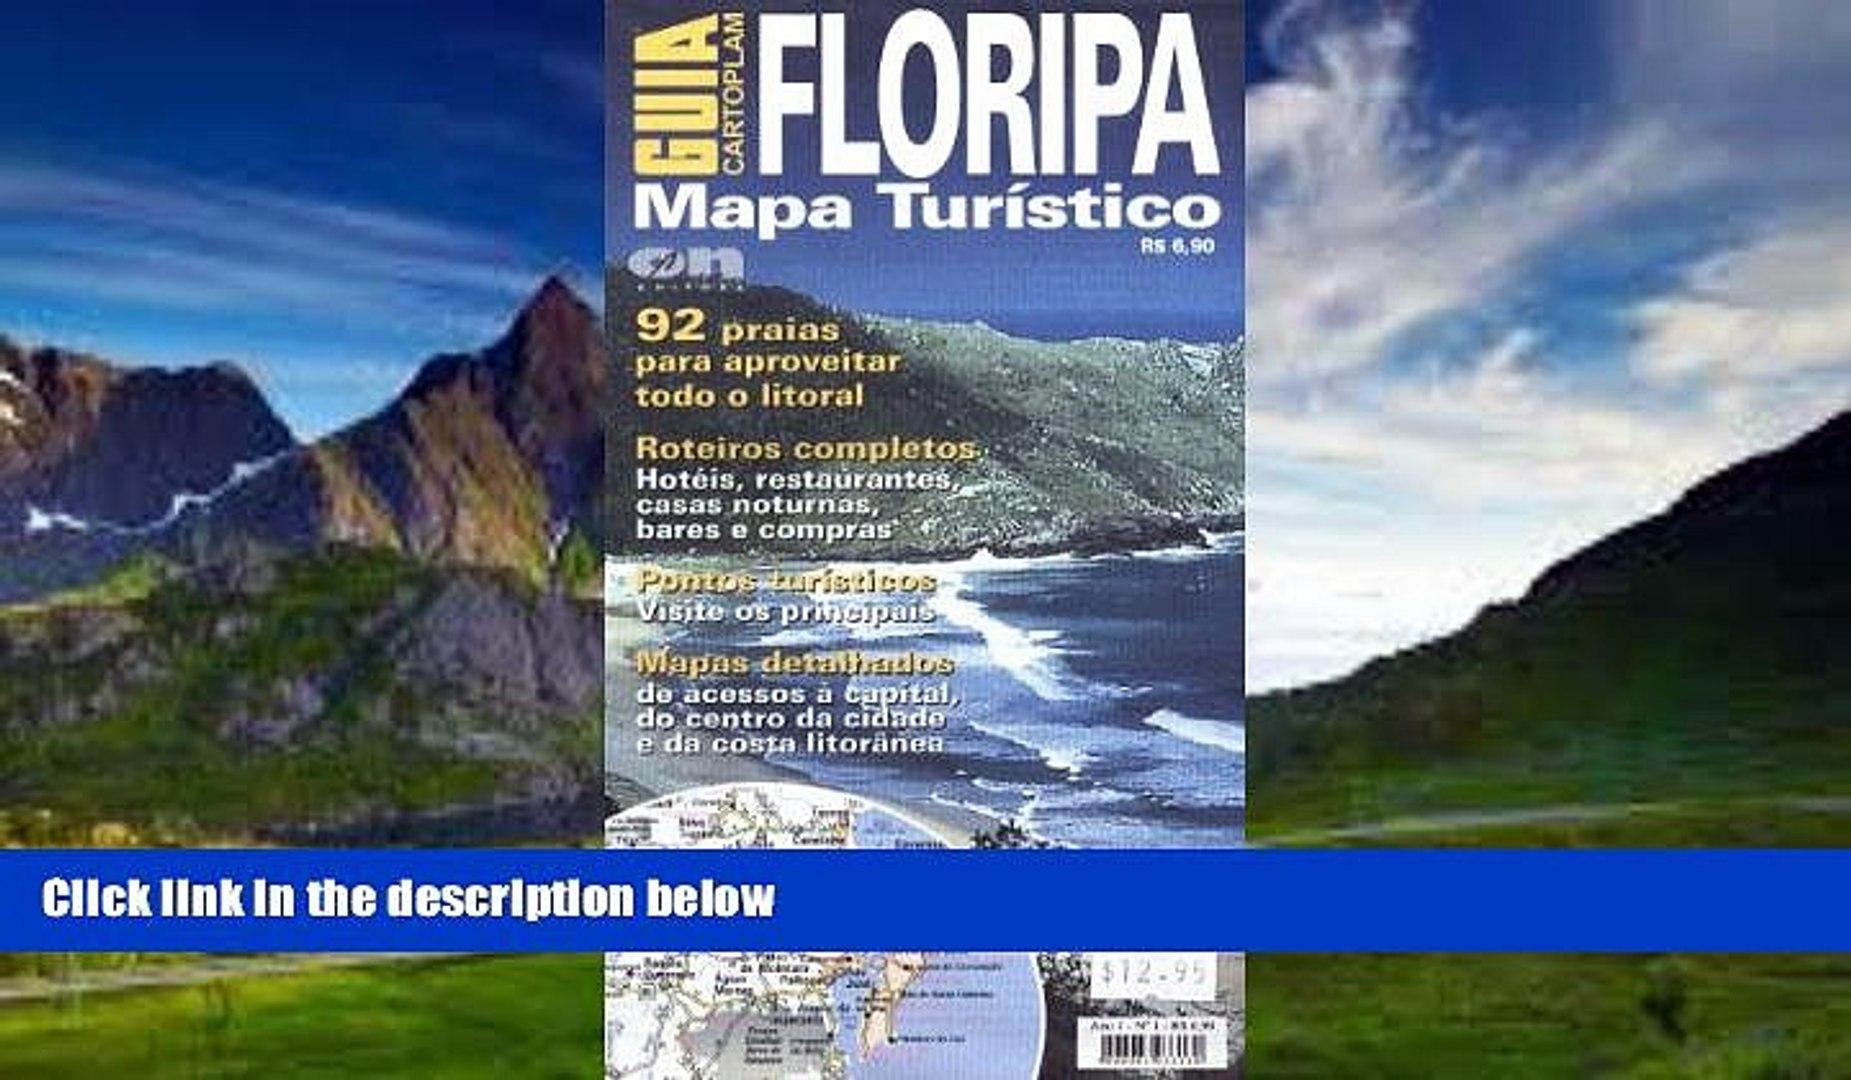 Editora online FLORIPA - Santa Catarina Island (Brazil) Visitor s Map (Spanish Edition)  Epub